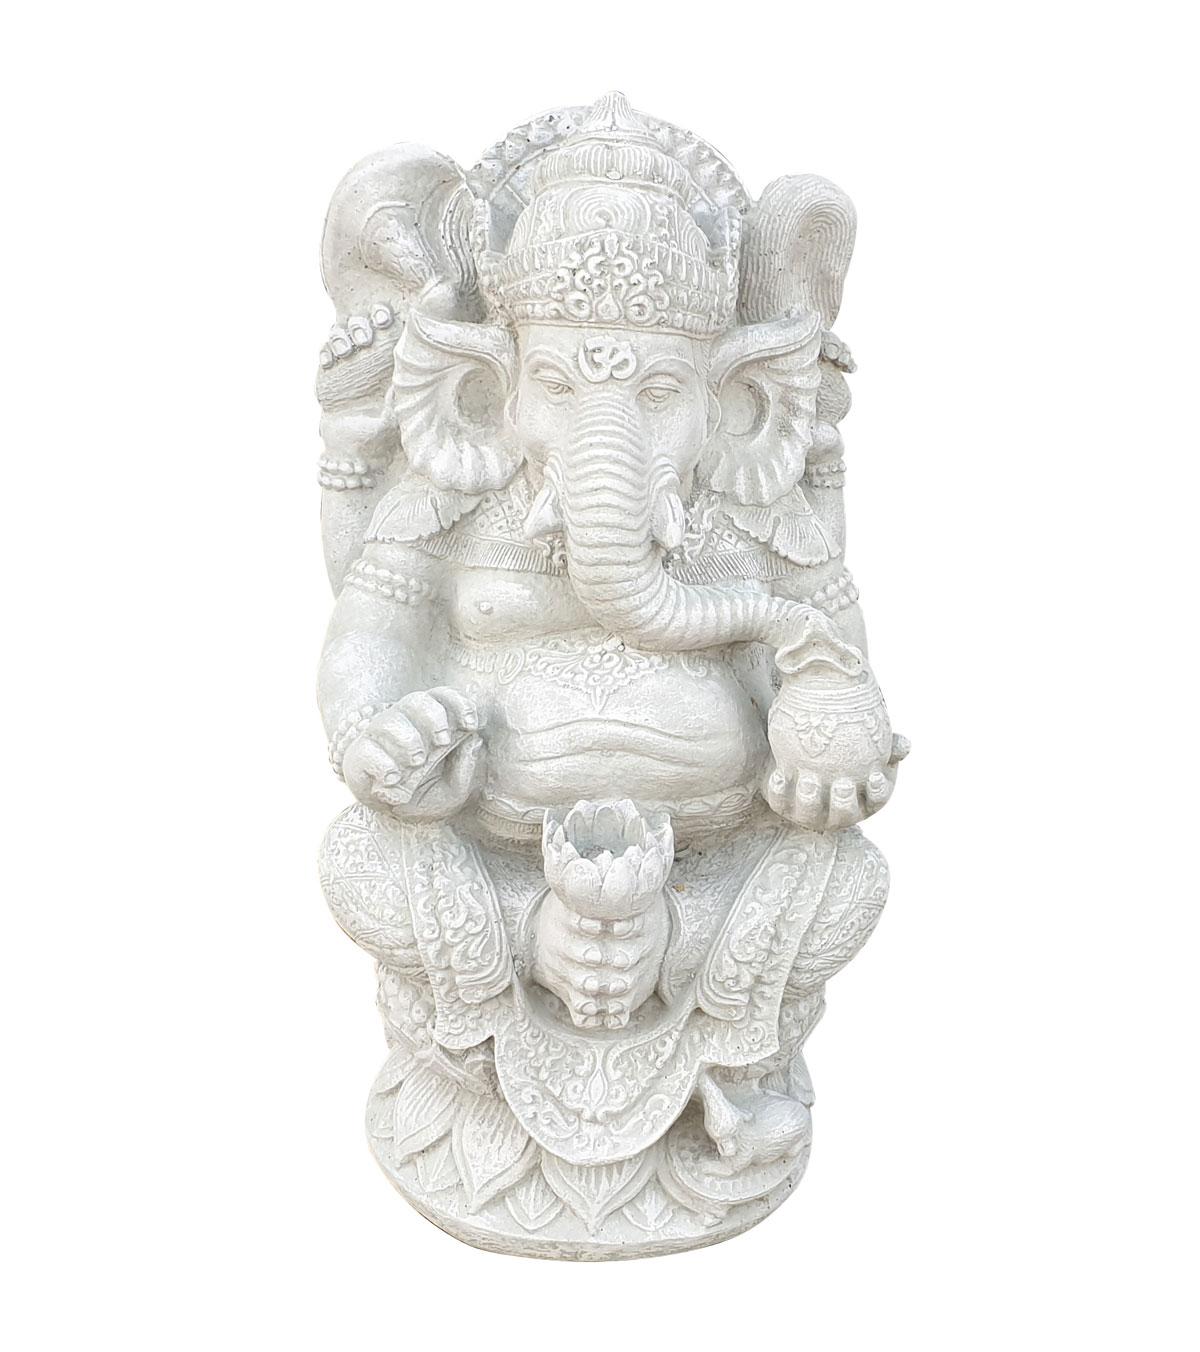 Boeddha Beeld Beton.Ganesha Beton